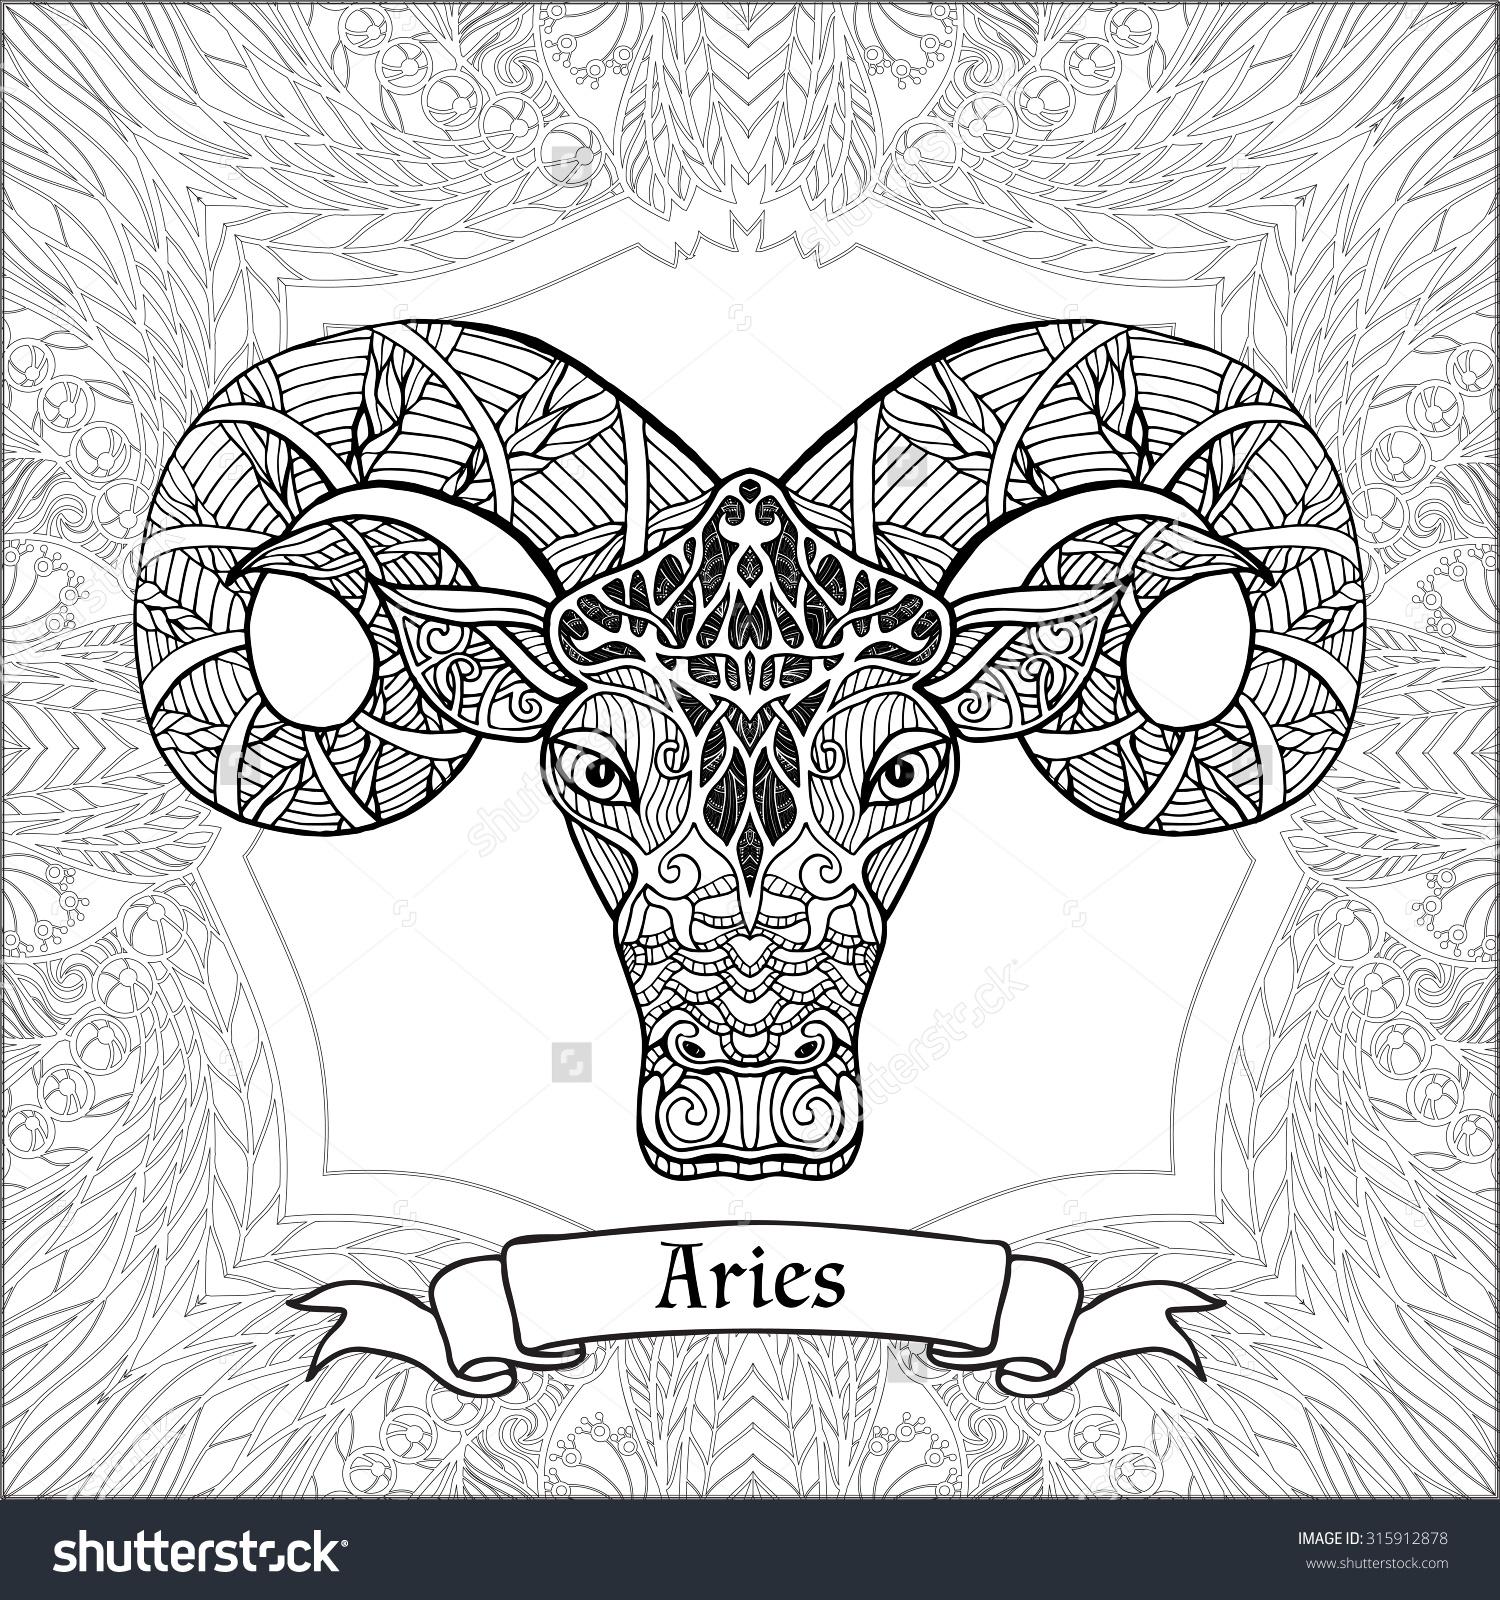 Aries coloring #15, Download drawings